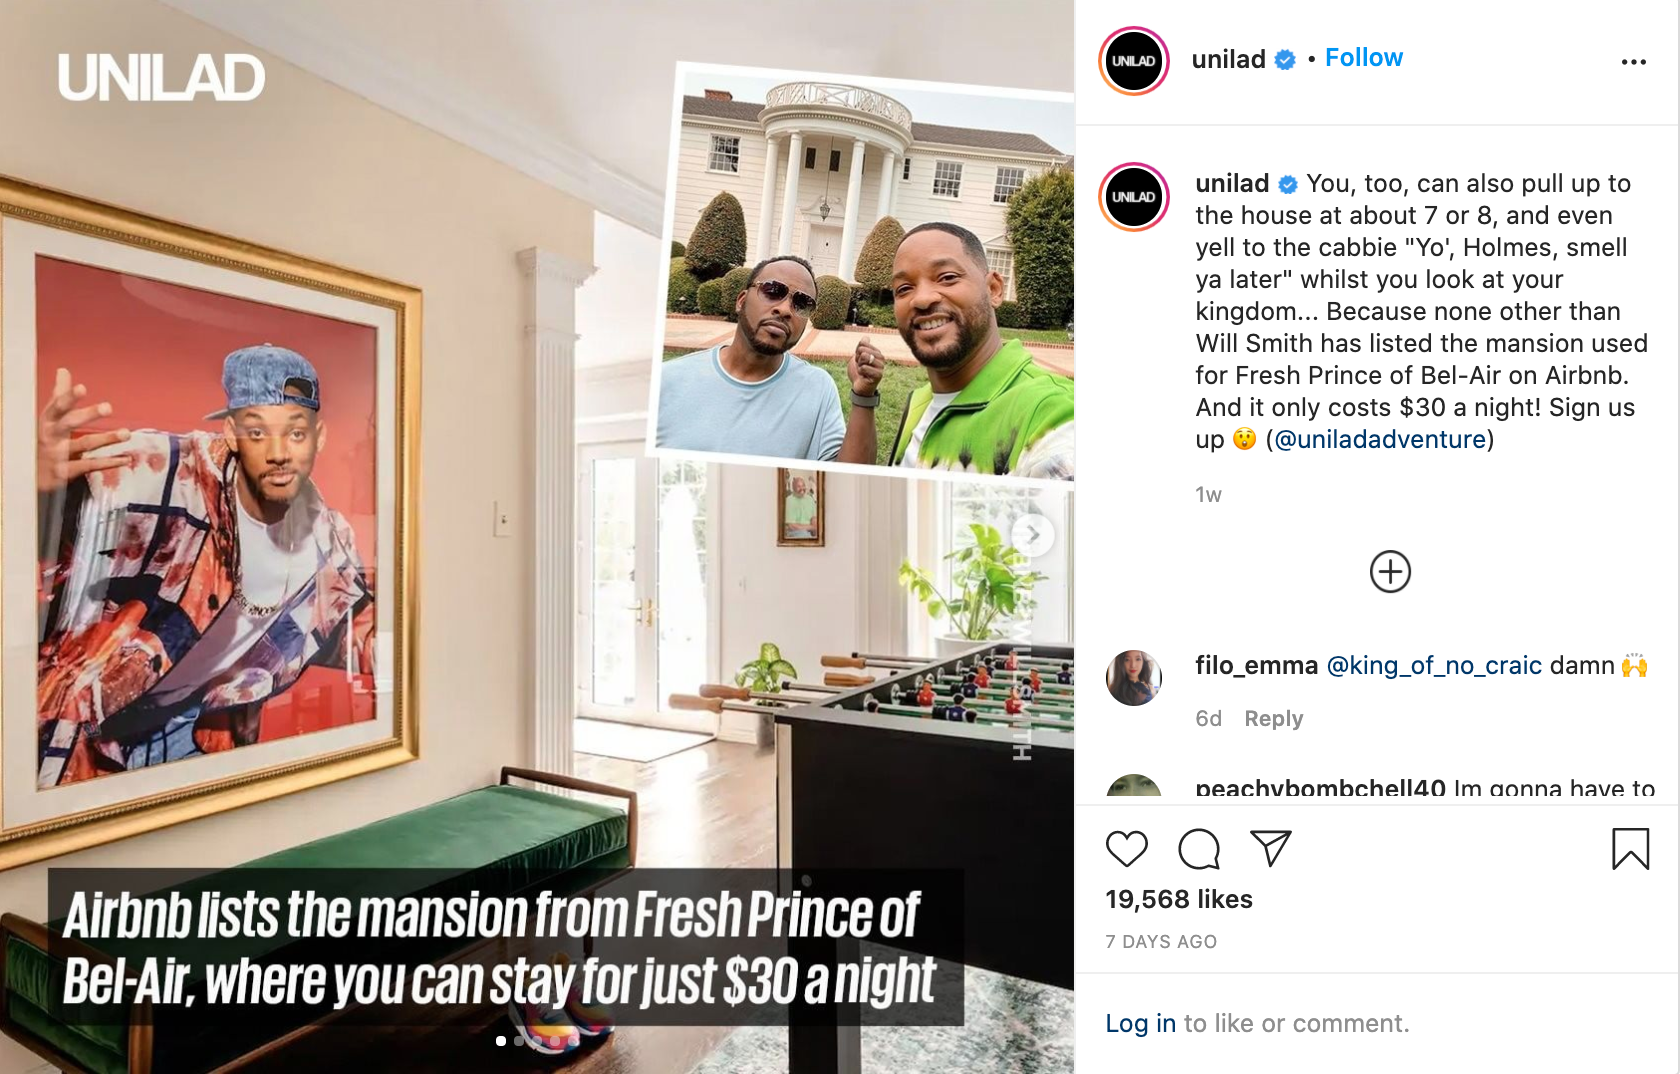 airbnb insta post 1